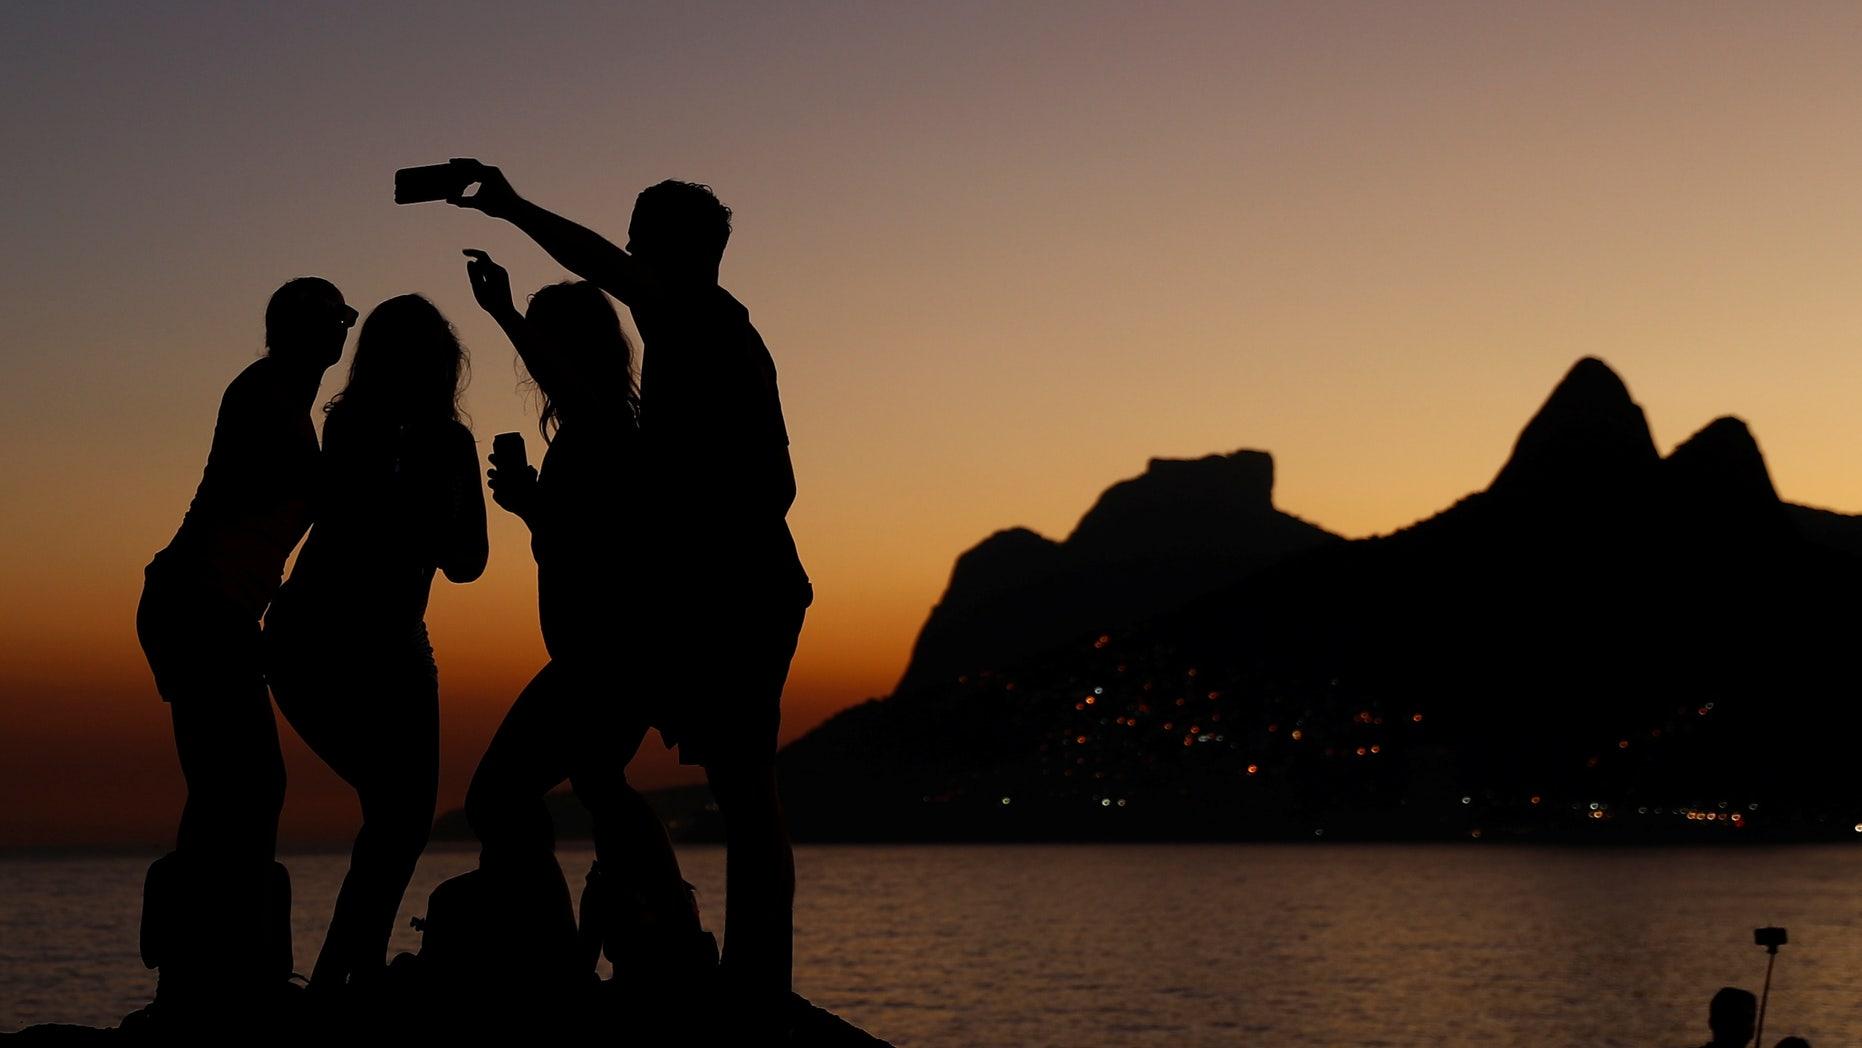 People take selfies during sunset on the rocks of Arpoador beach in Rio de Janeiro, Brazil July 4, 2016.